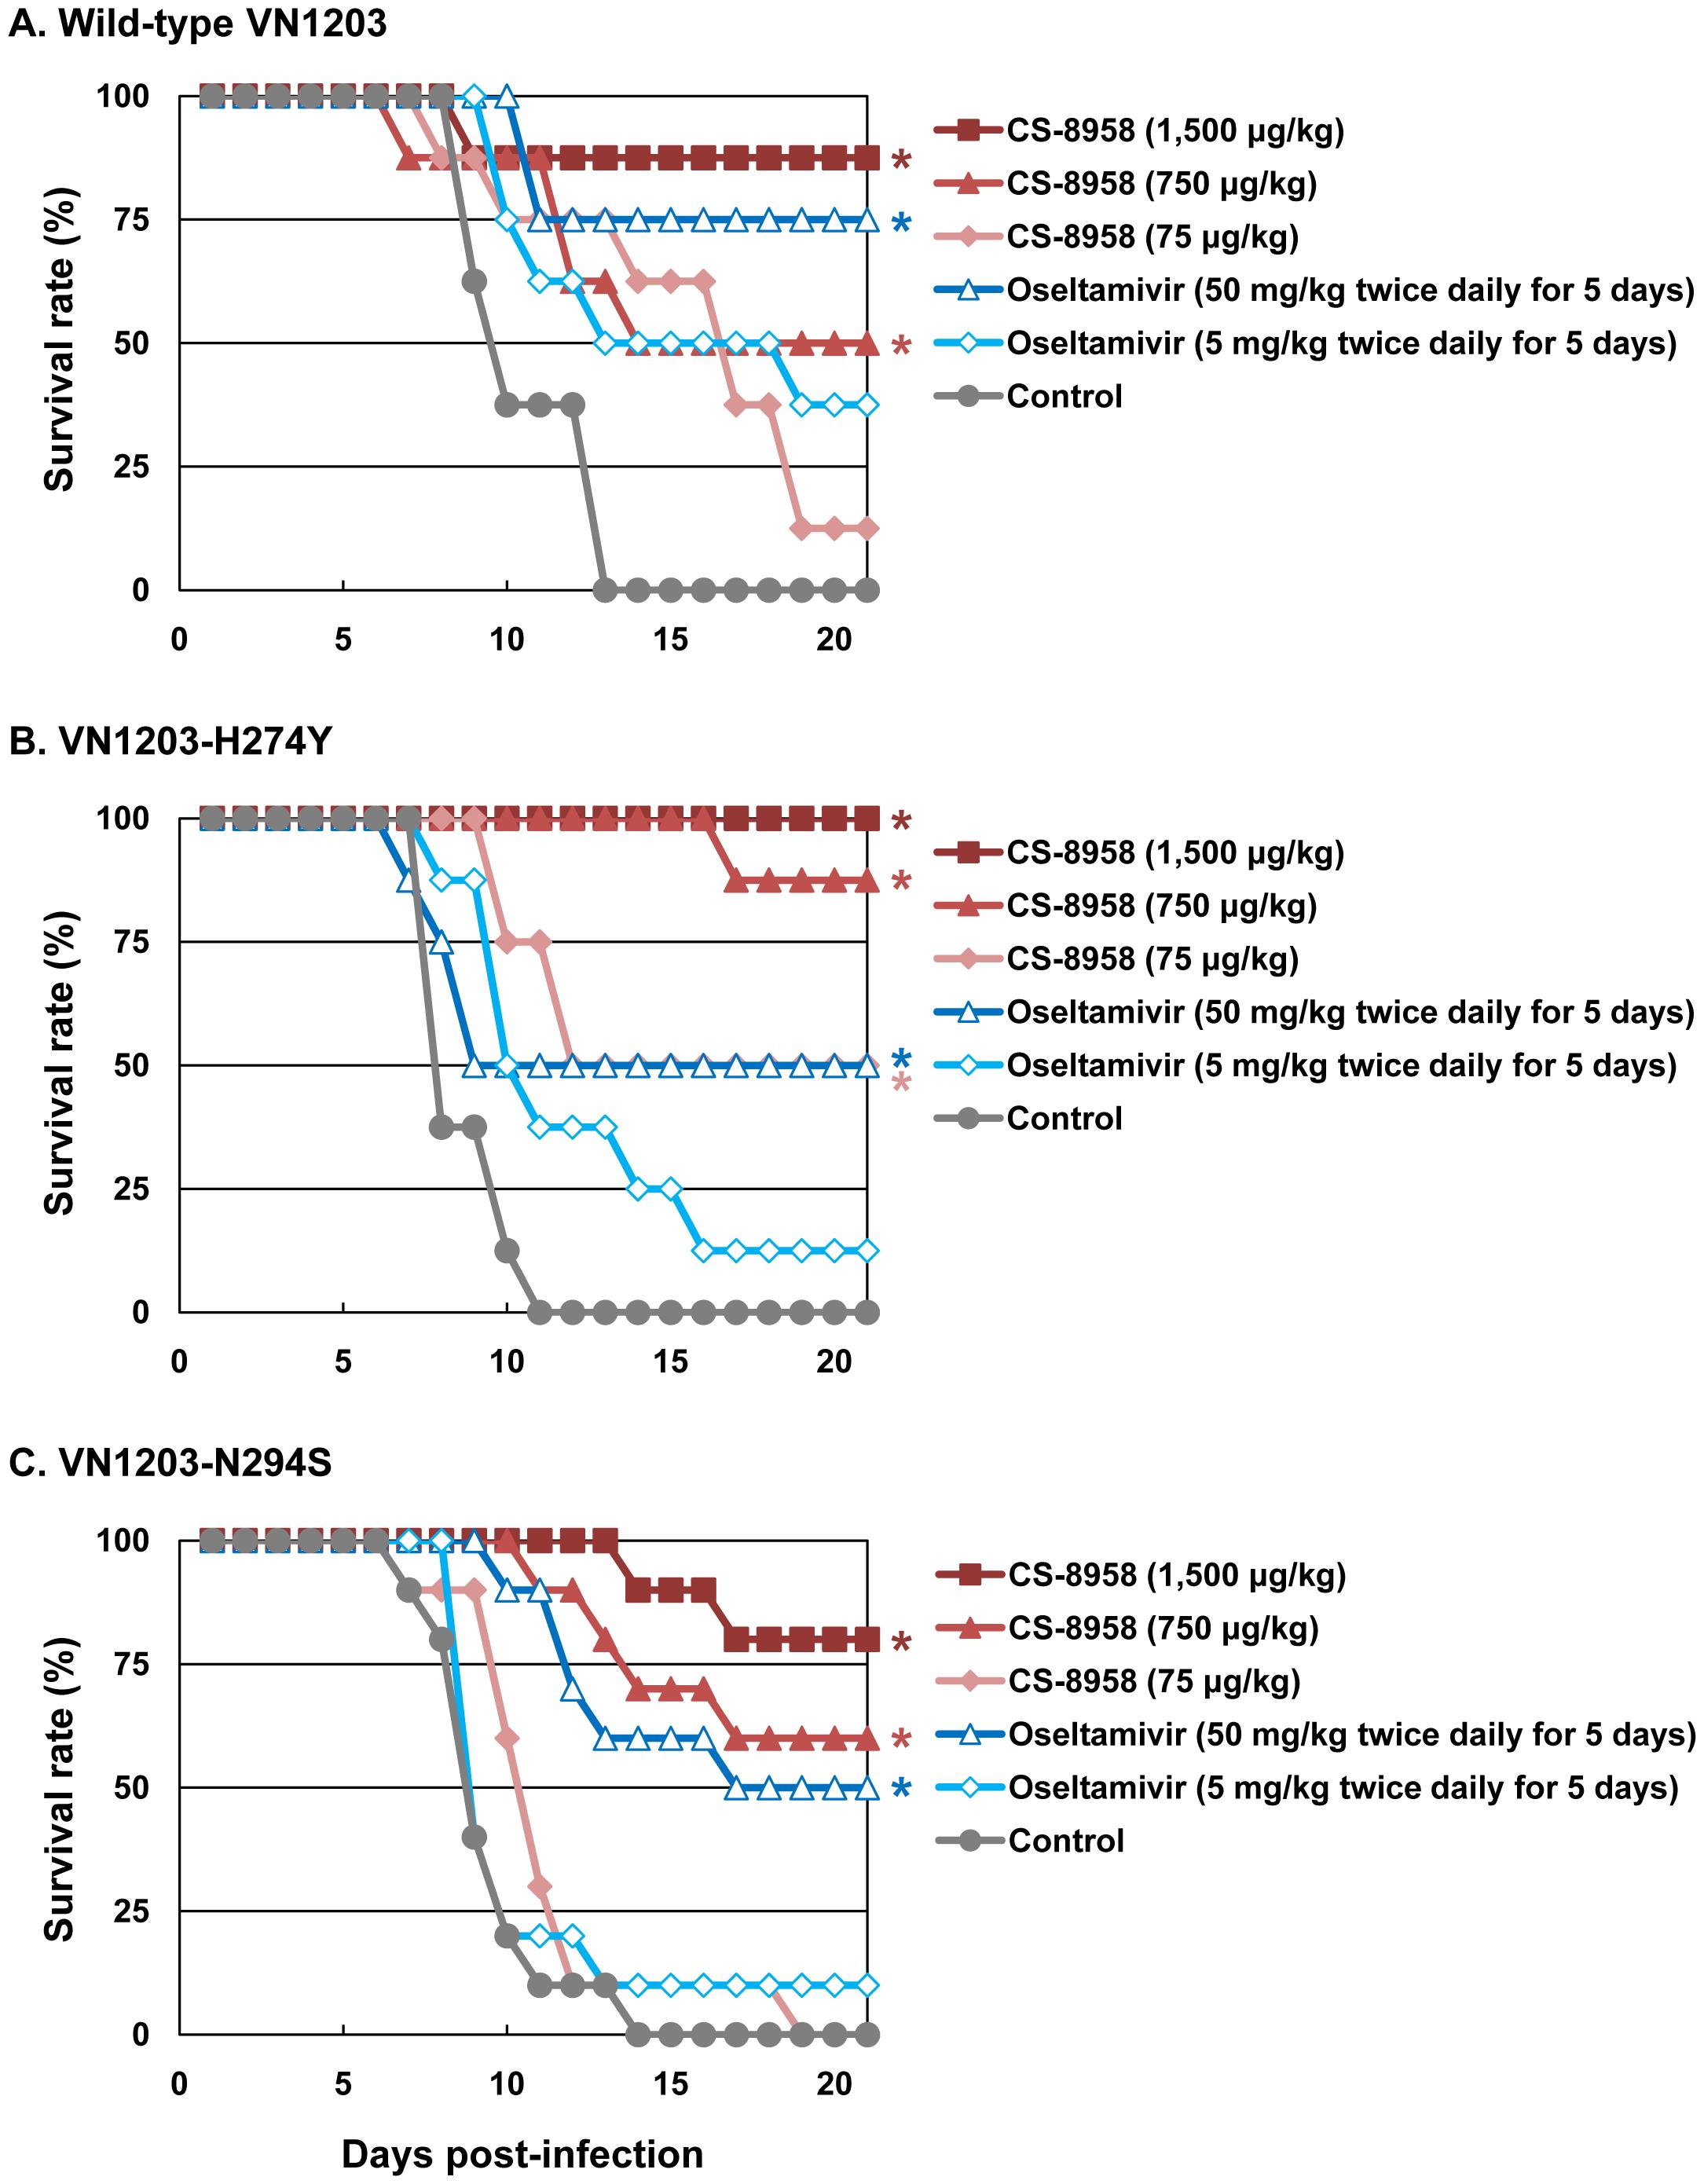 Therapeutic efficacy of CS-8958 and oseltamivir phosphate against oseltamivir-resistant H5N1 influenza viruses in mice.